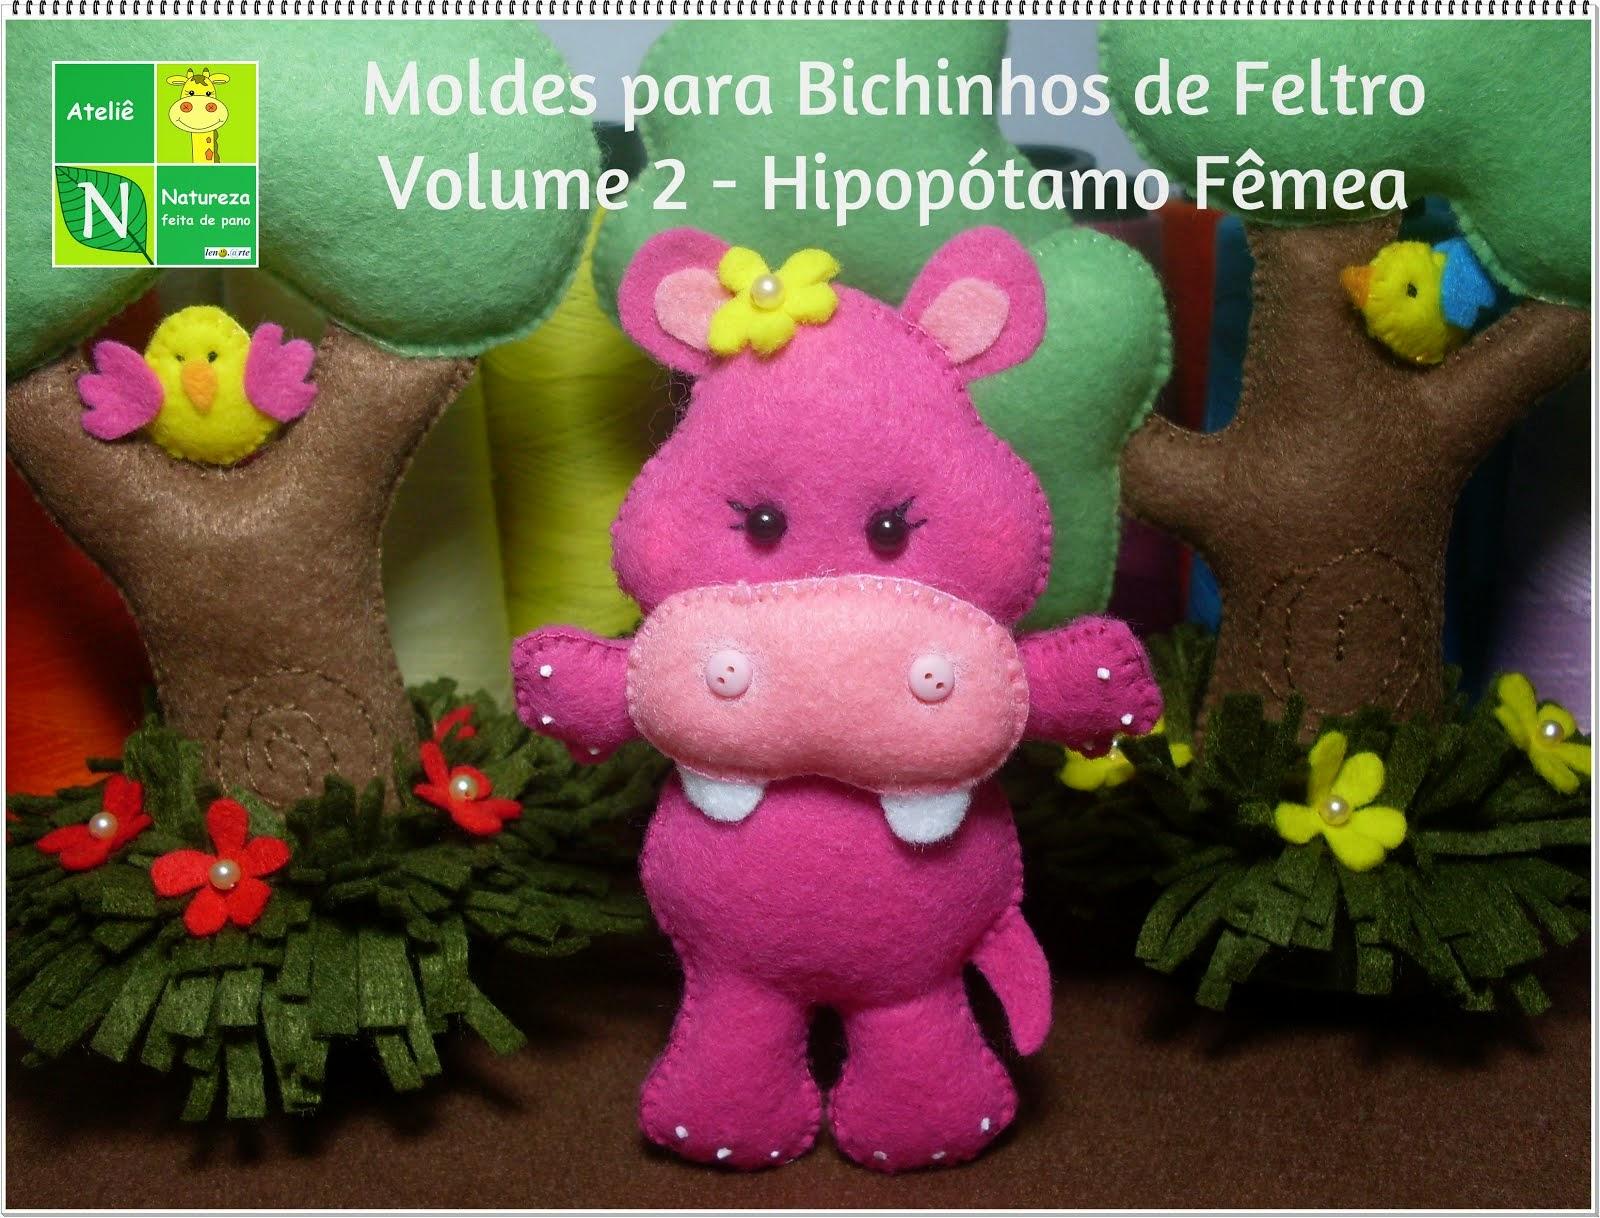 Apostila Digital/Moldes para Bichinhos de Feltro Volume 2 Hipopótamo Fêmea